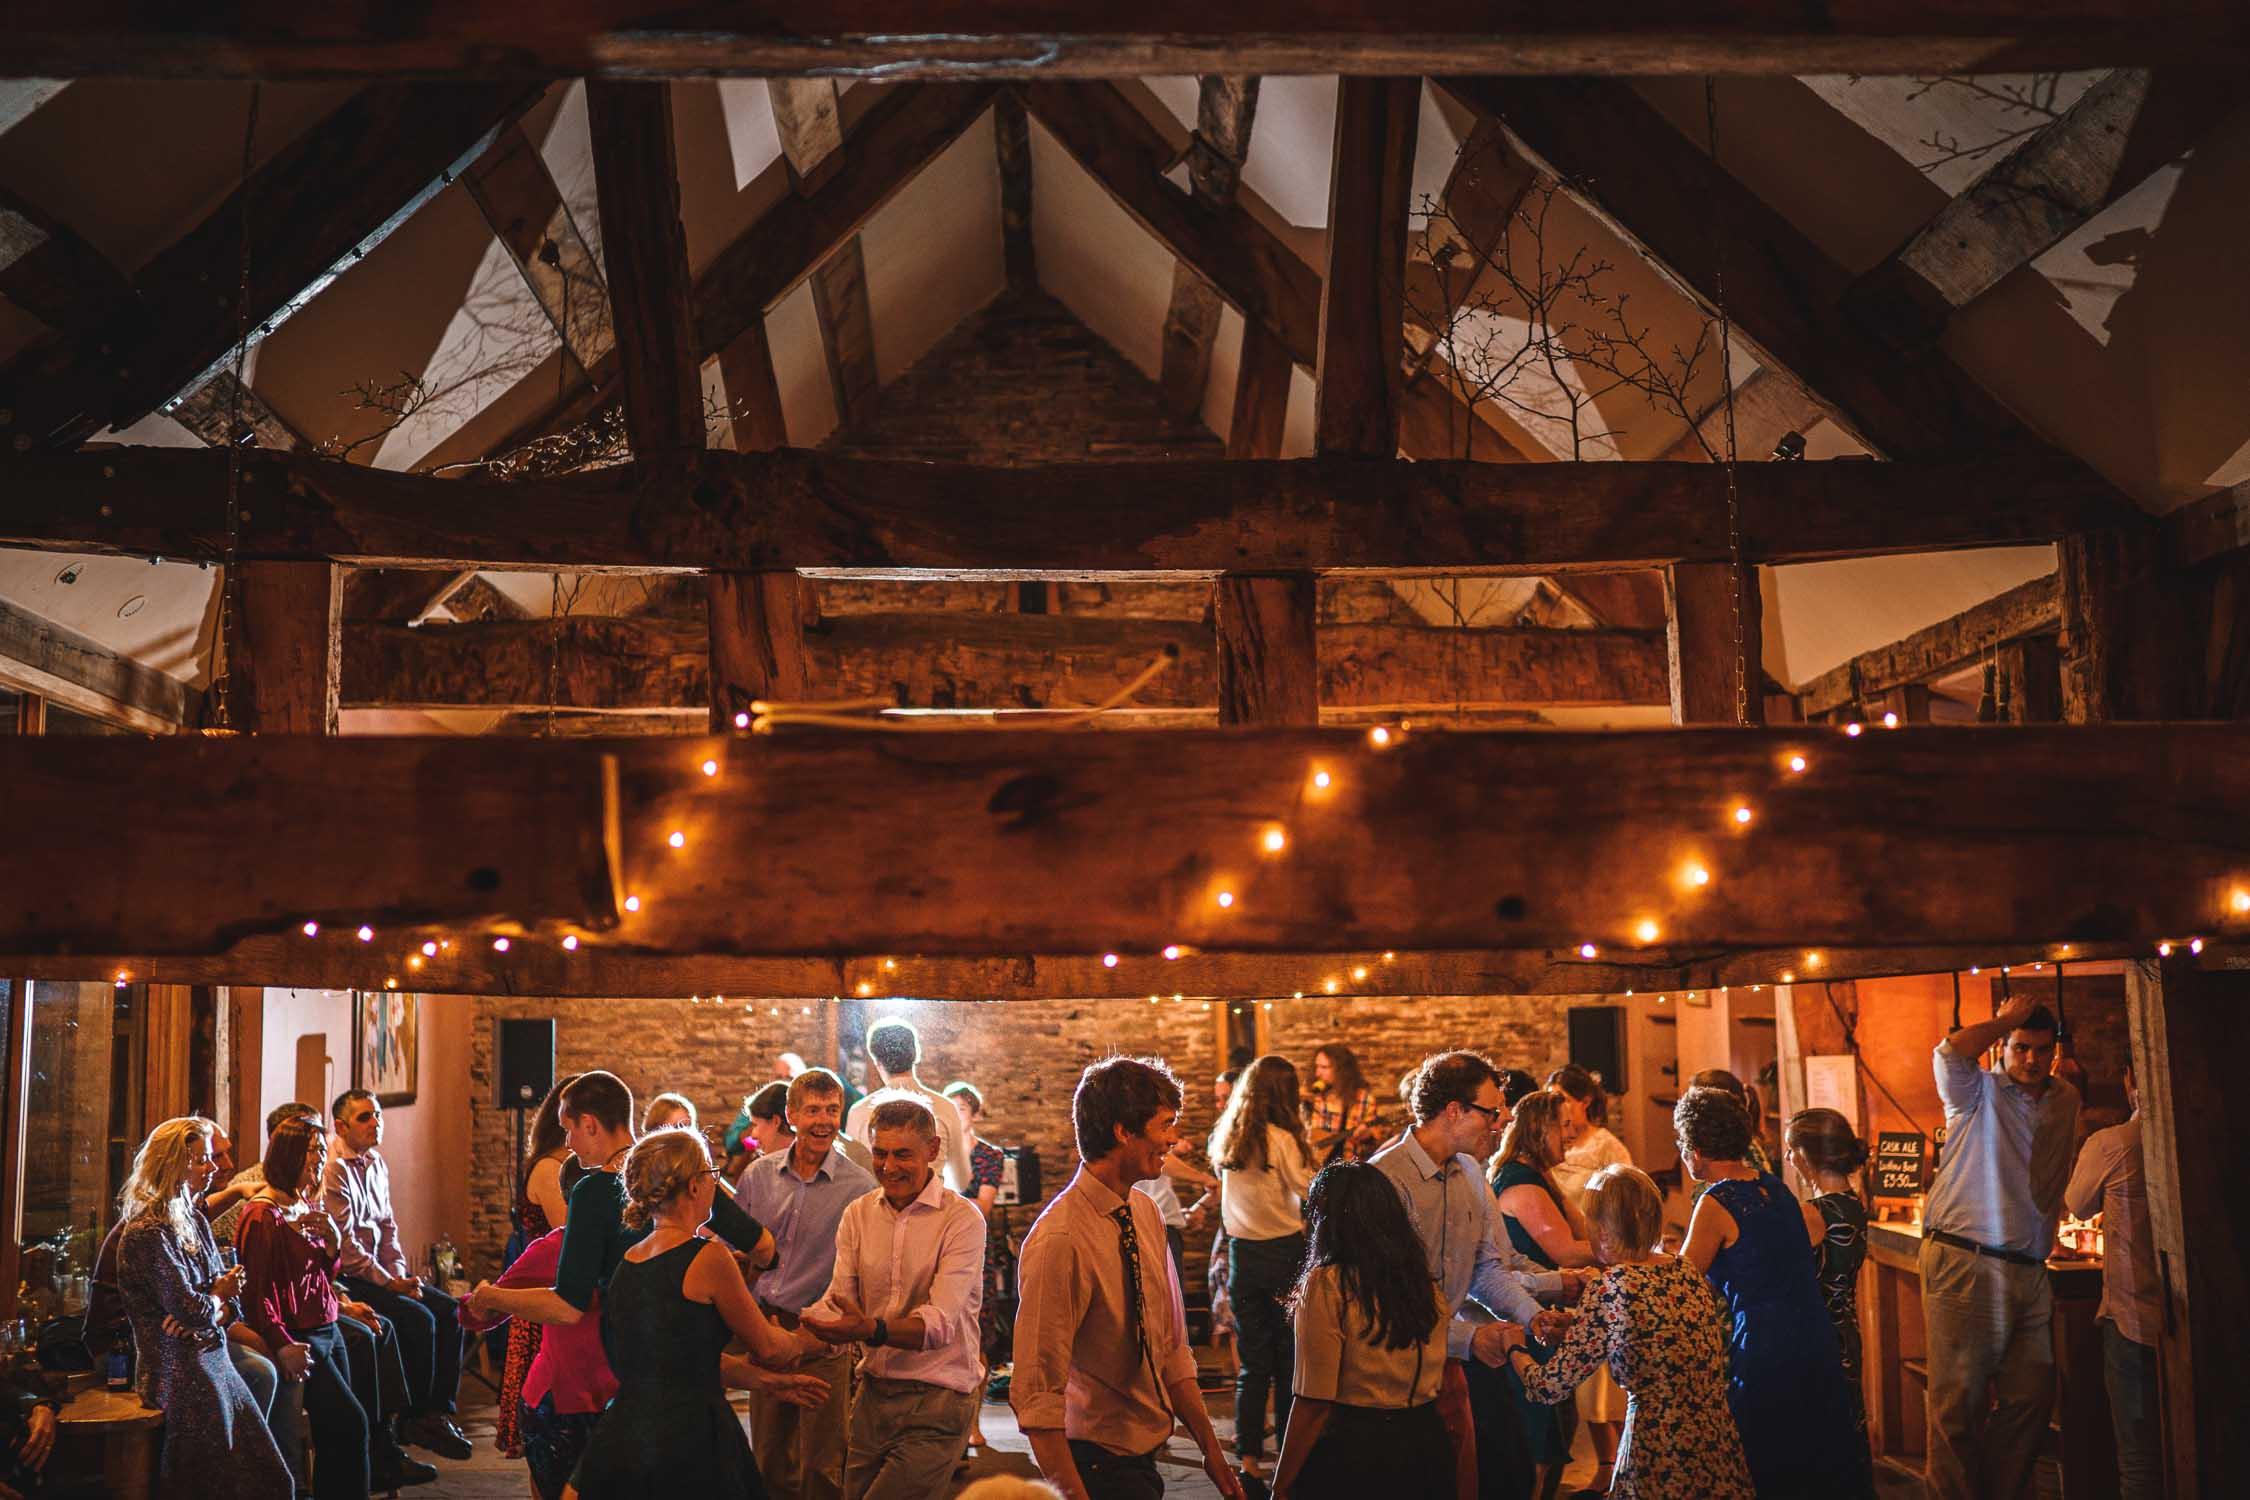 Lower House Farm Wedding Photography, Bespoke By Nature Wedding, Herefordshire Wedding Venue, Outdoor Country Wedding, Longtown Wedding, Wedding Photographers in Herefordshire